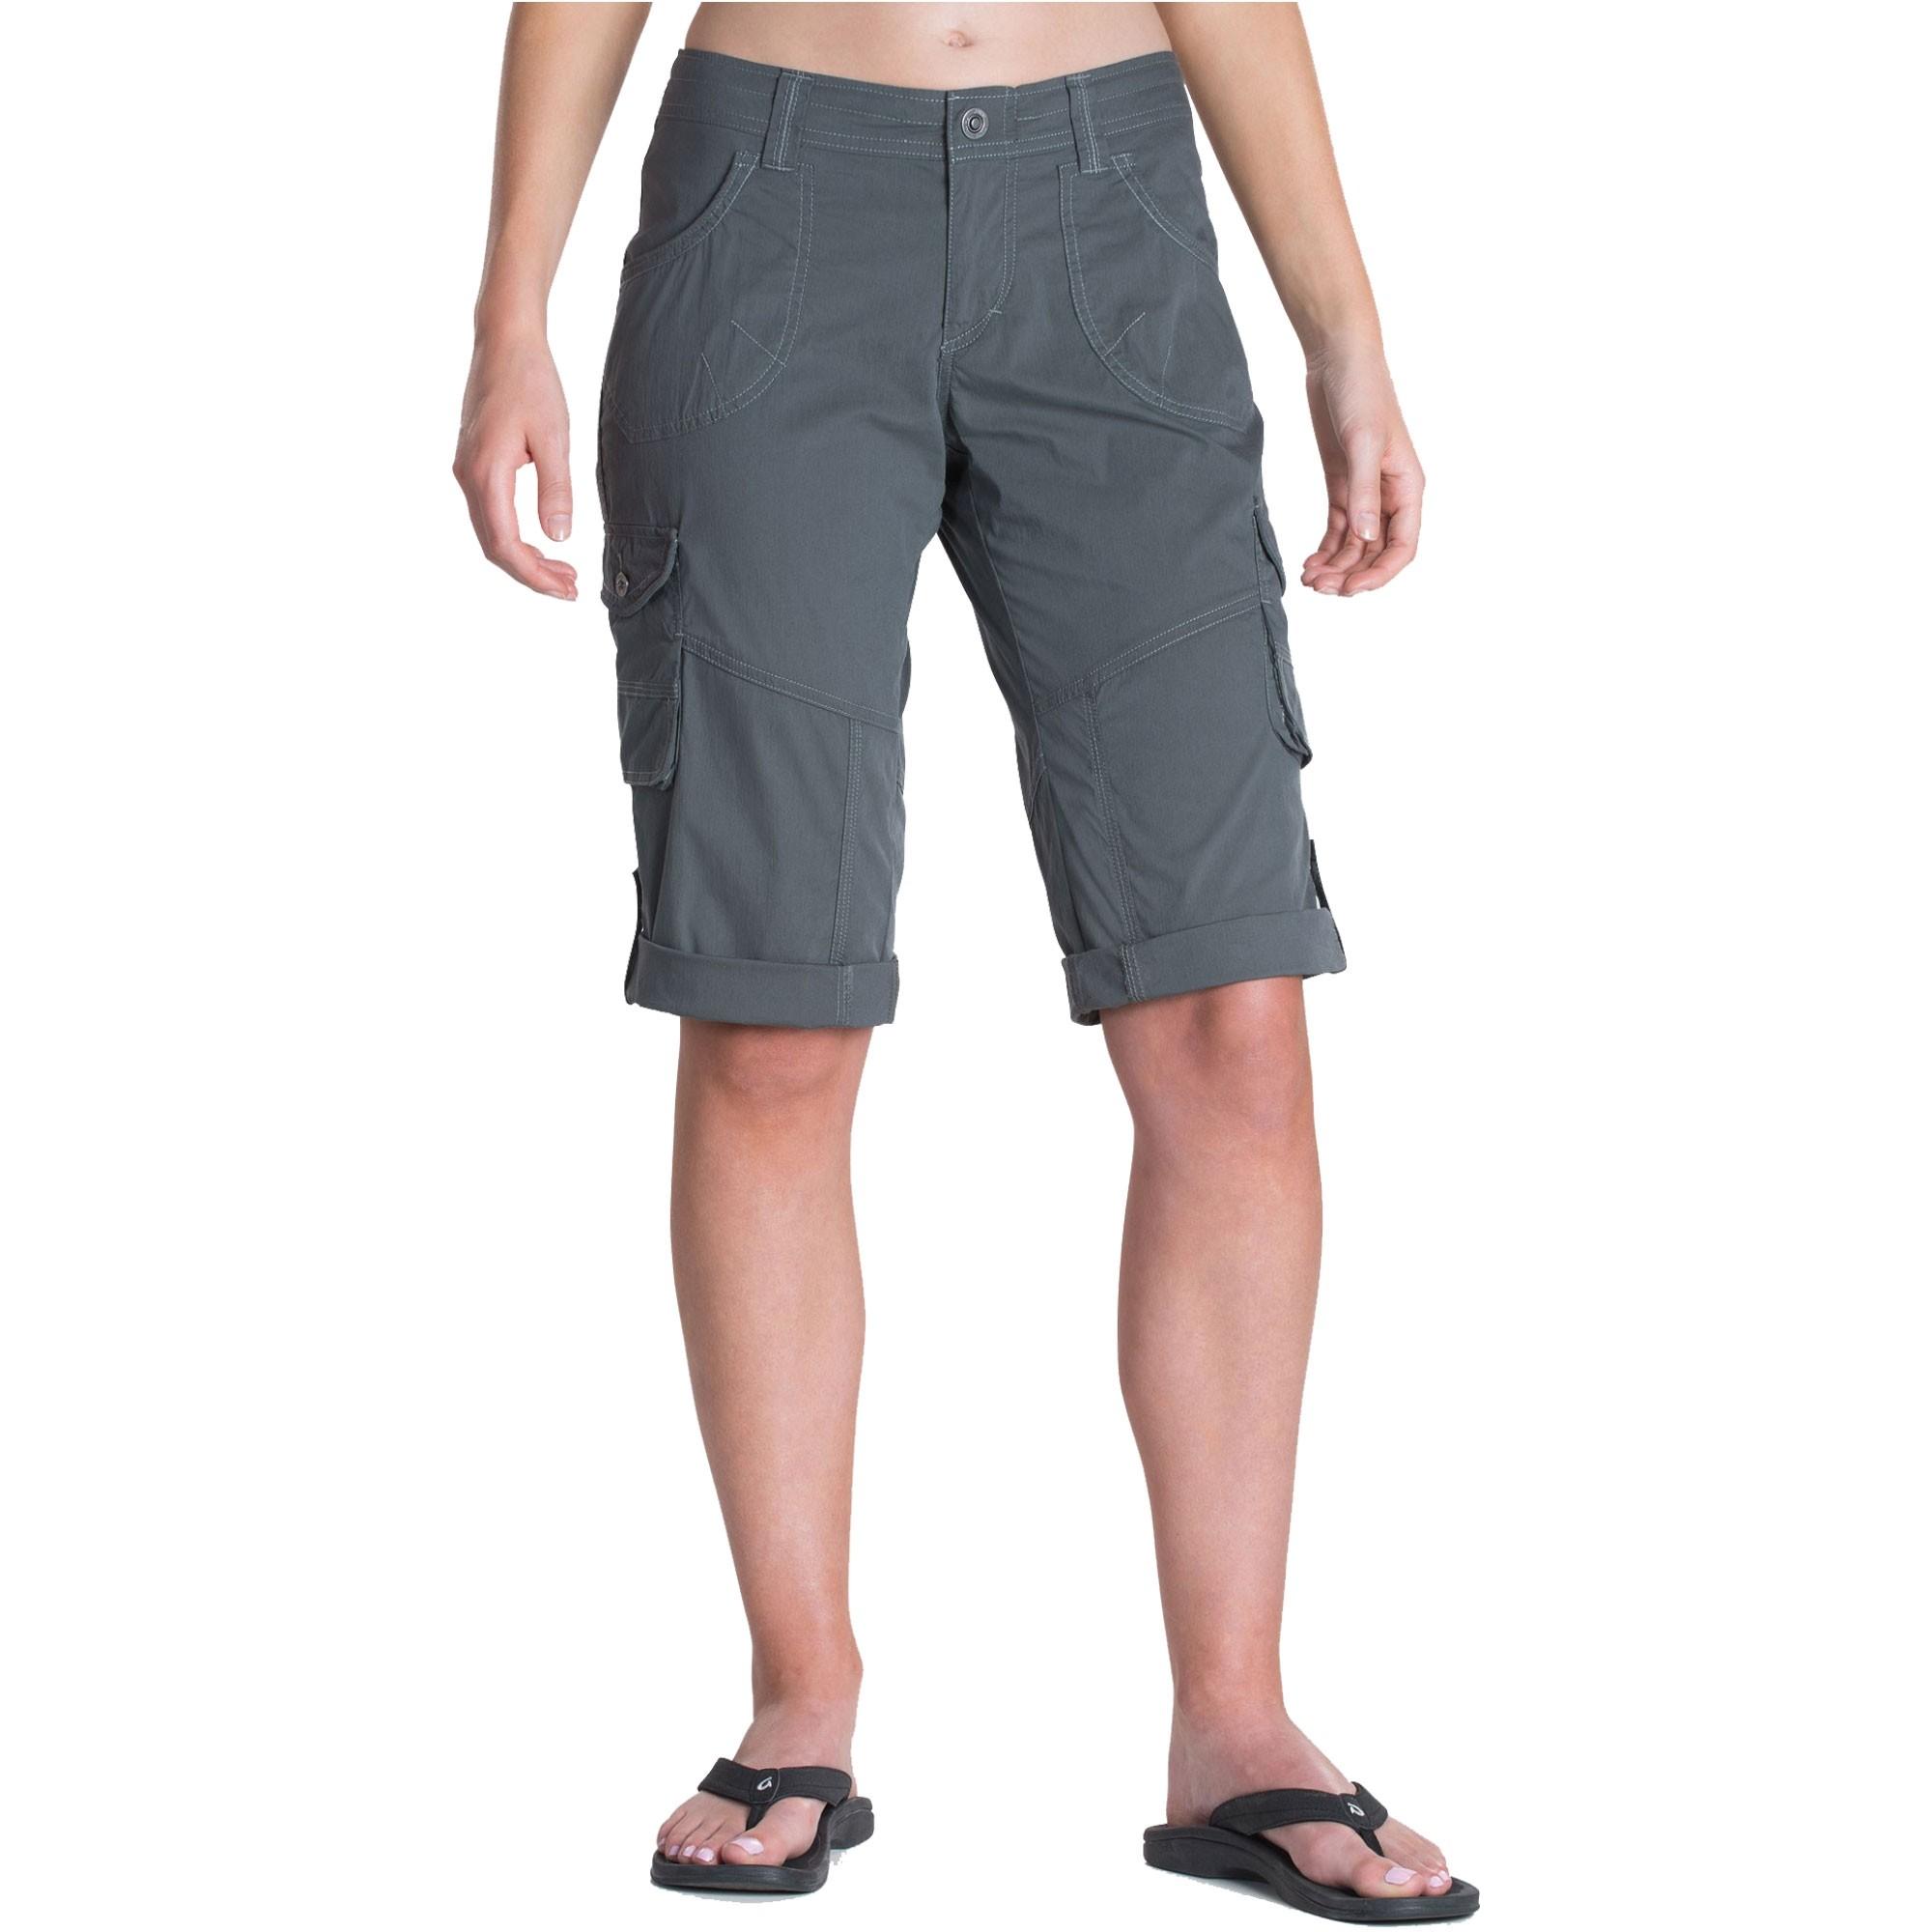 Kuhl Kontra Women's Shorts - Carbon